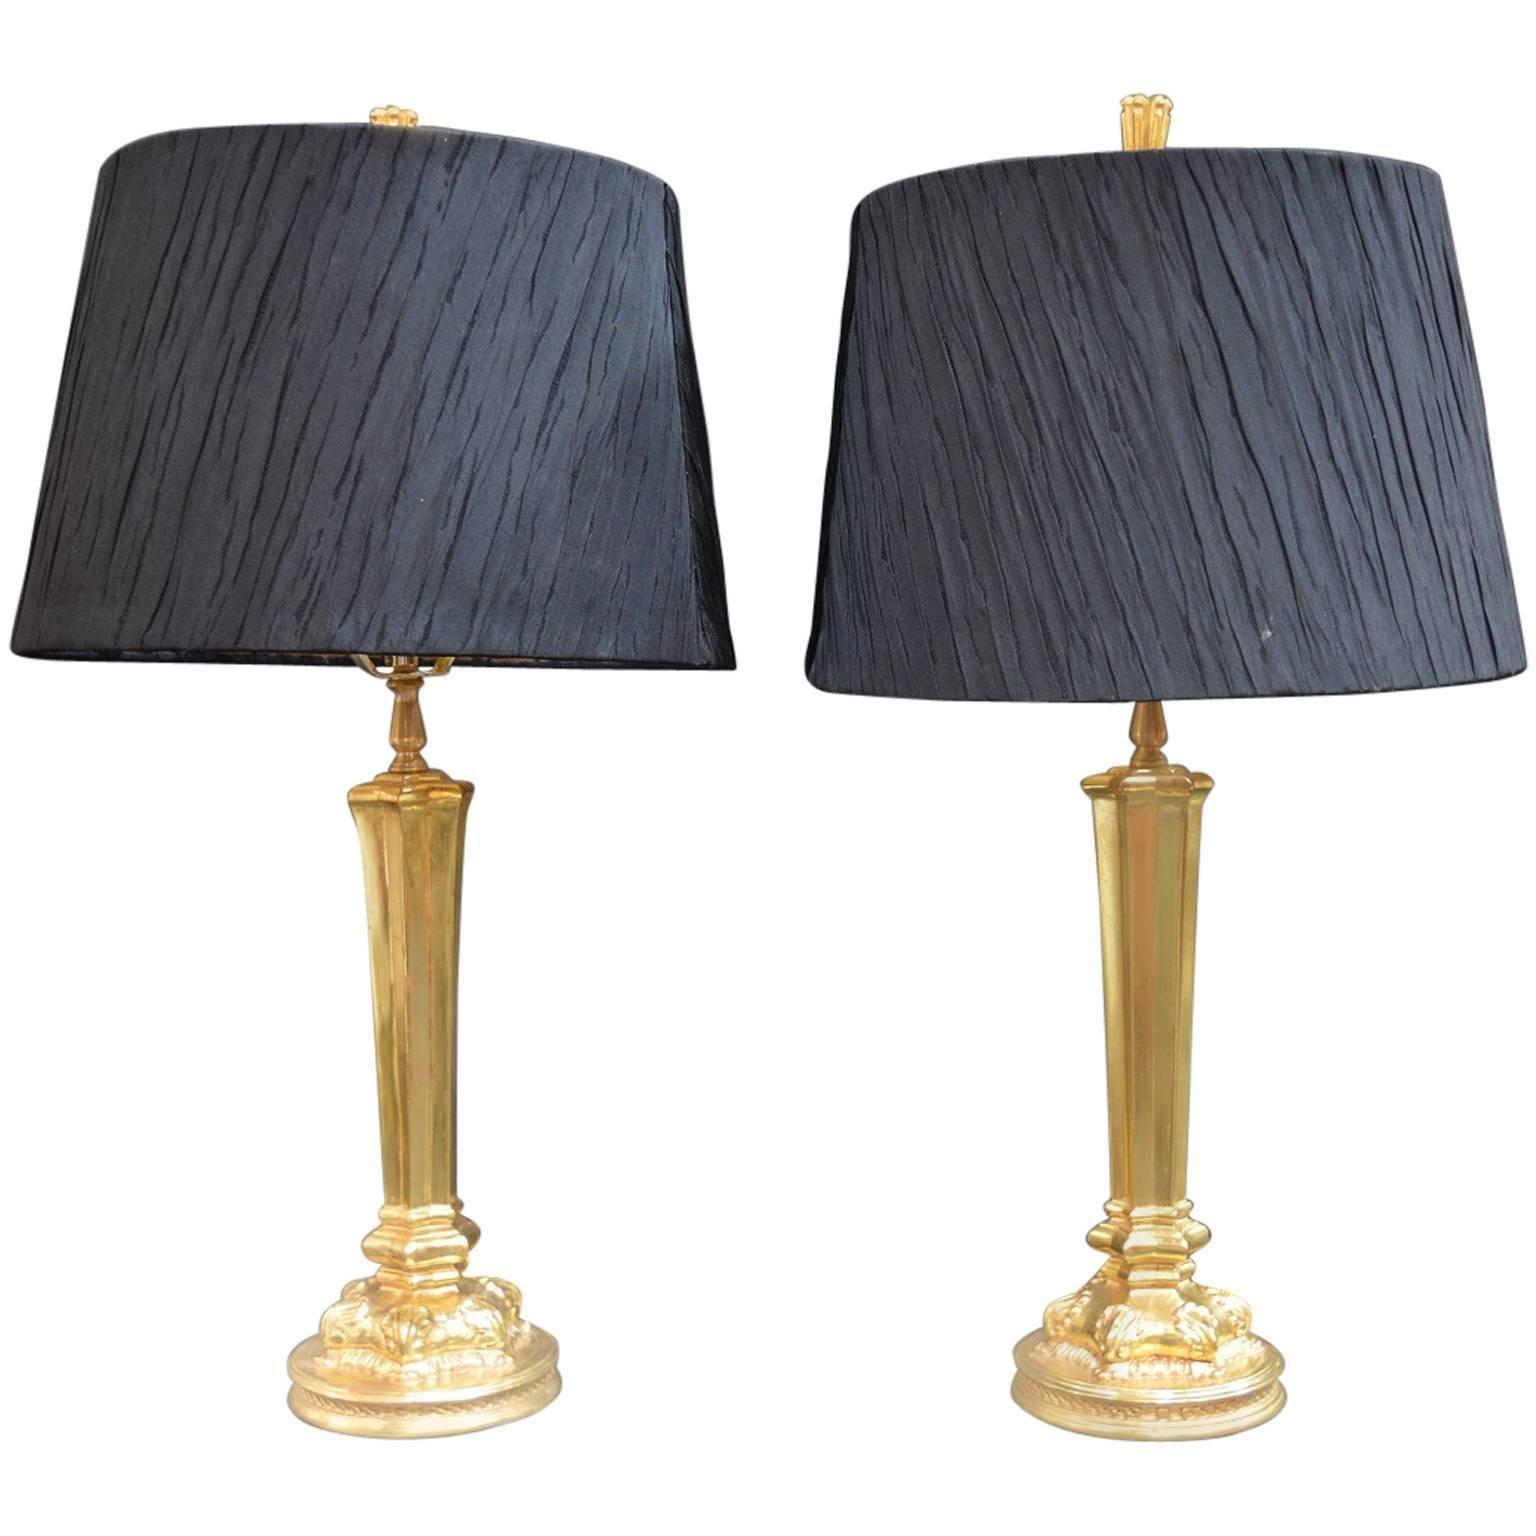 Pair of Gold Leaf Bryan Cox Lamps